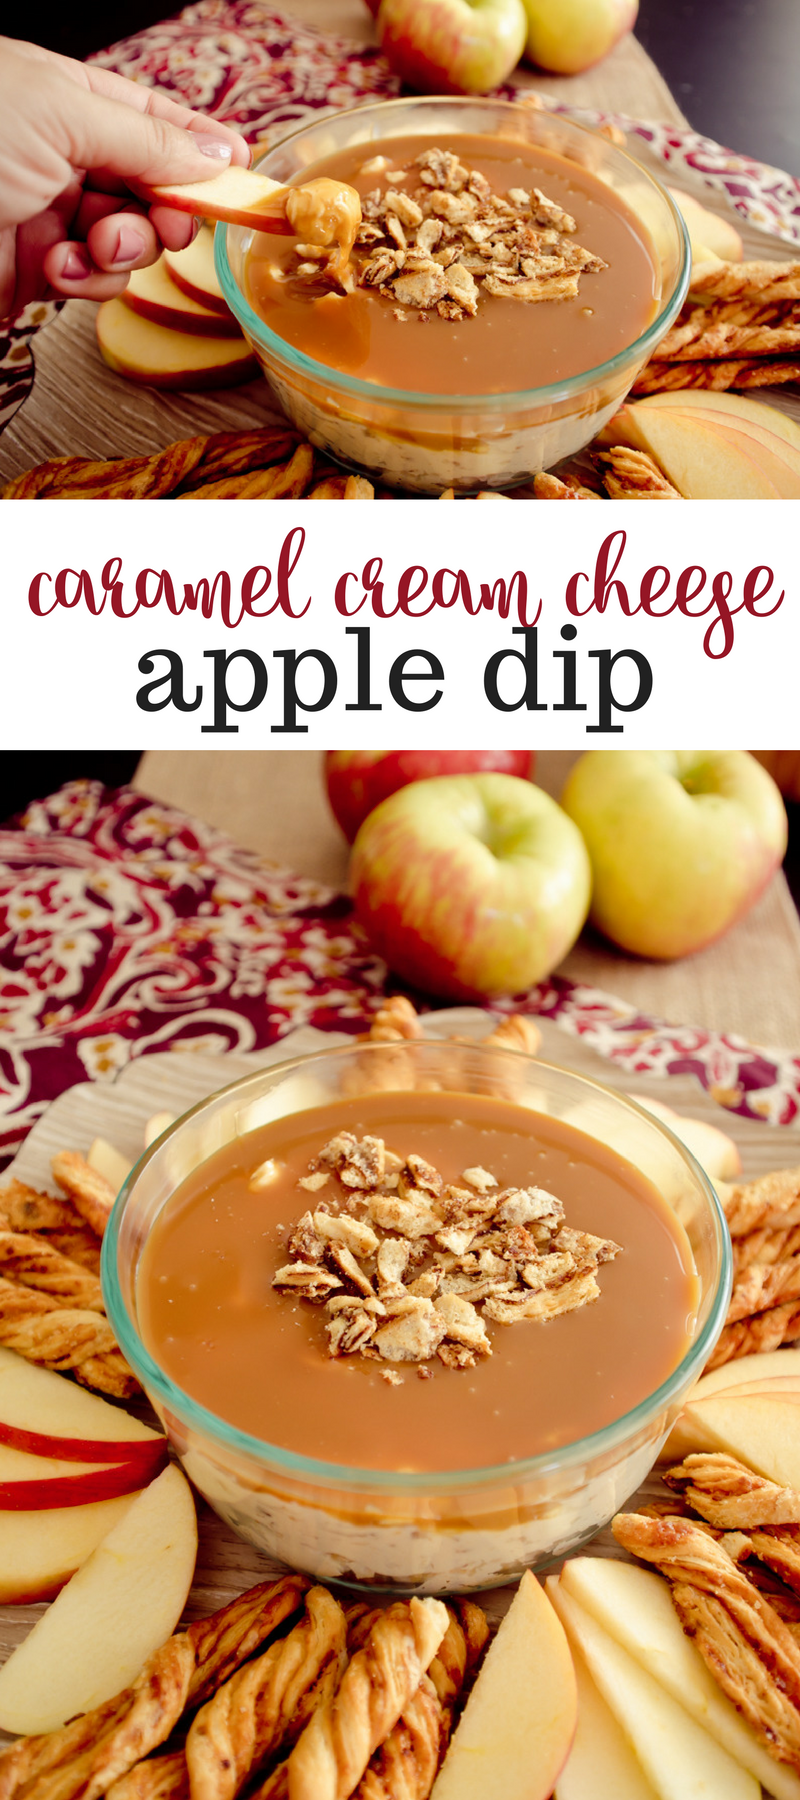 caramel-cream-cheese-apple-dip